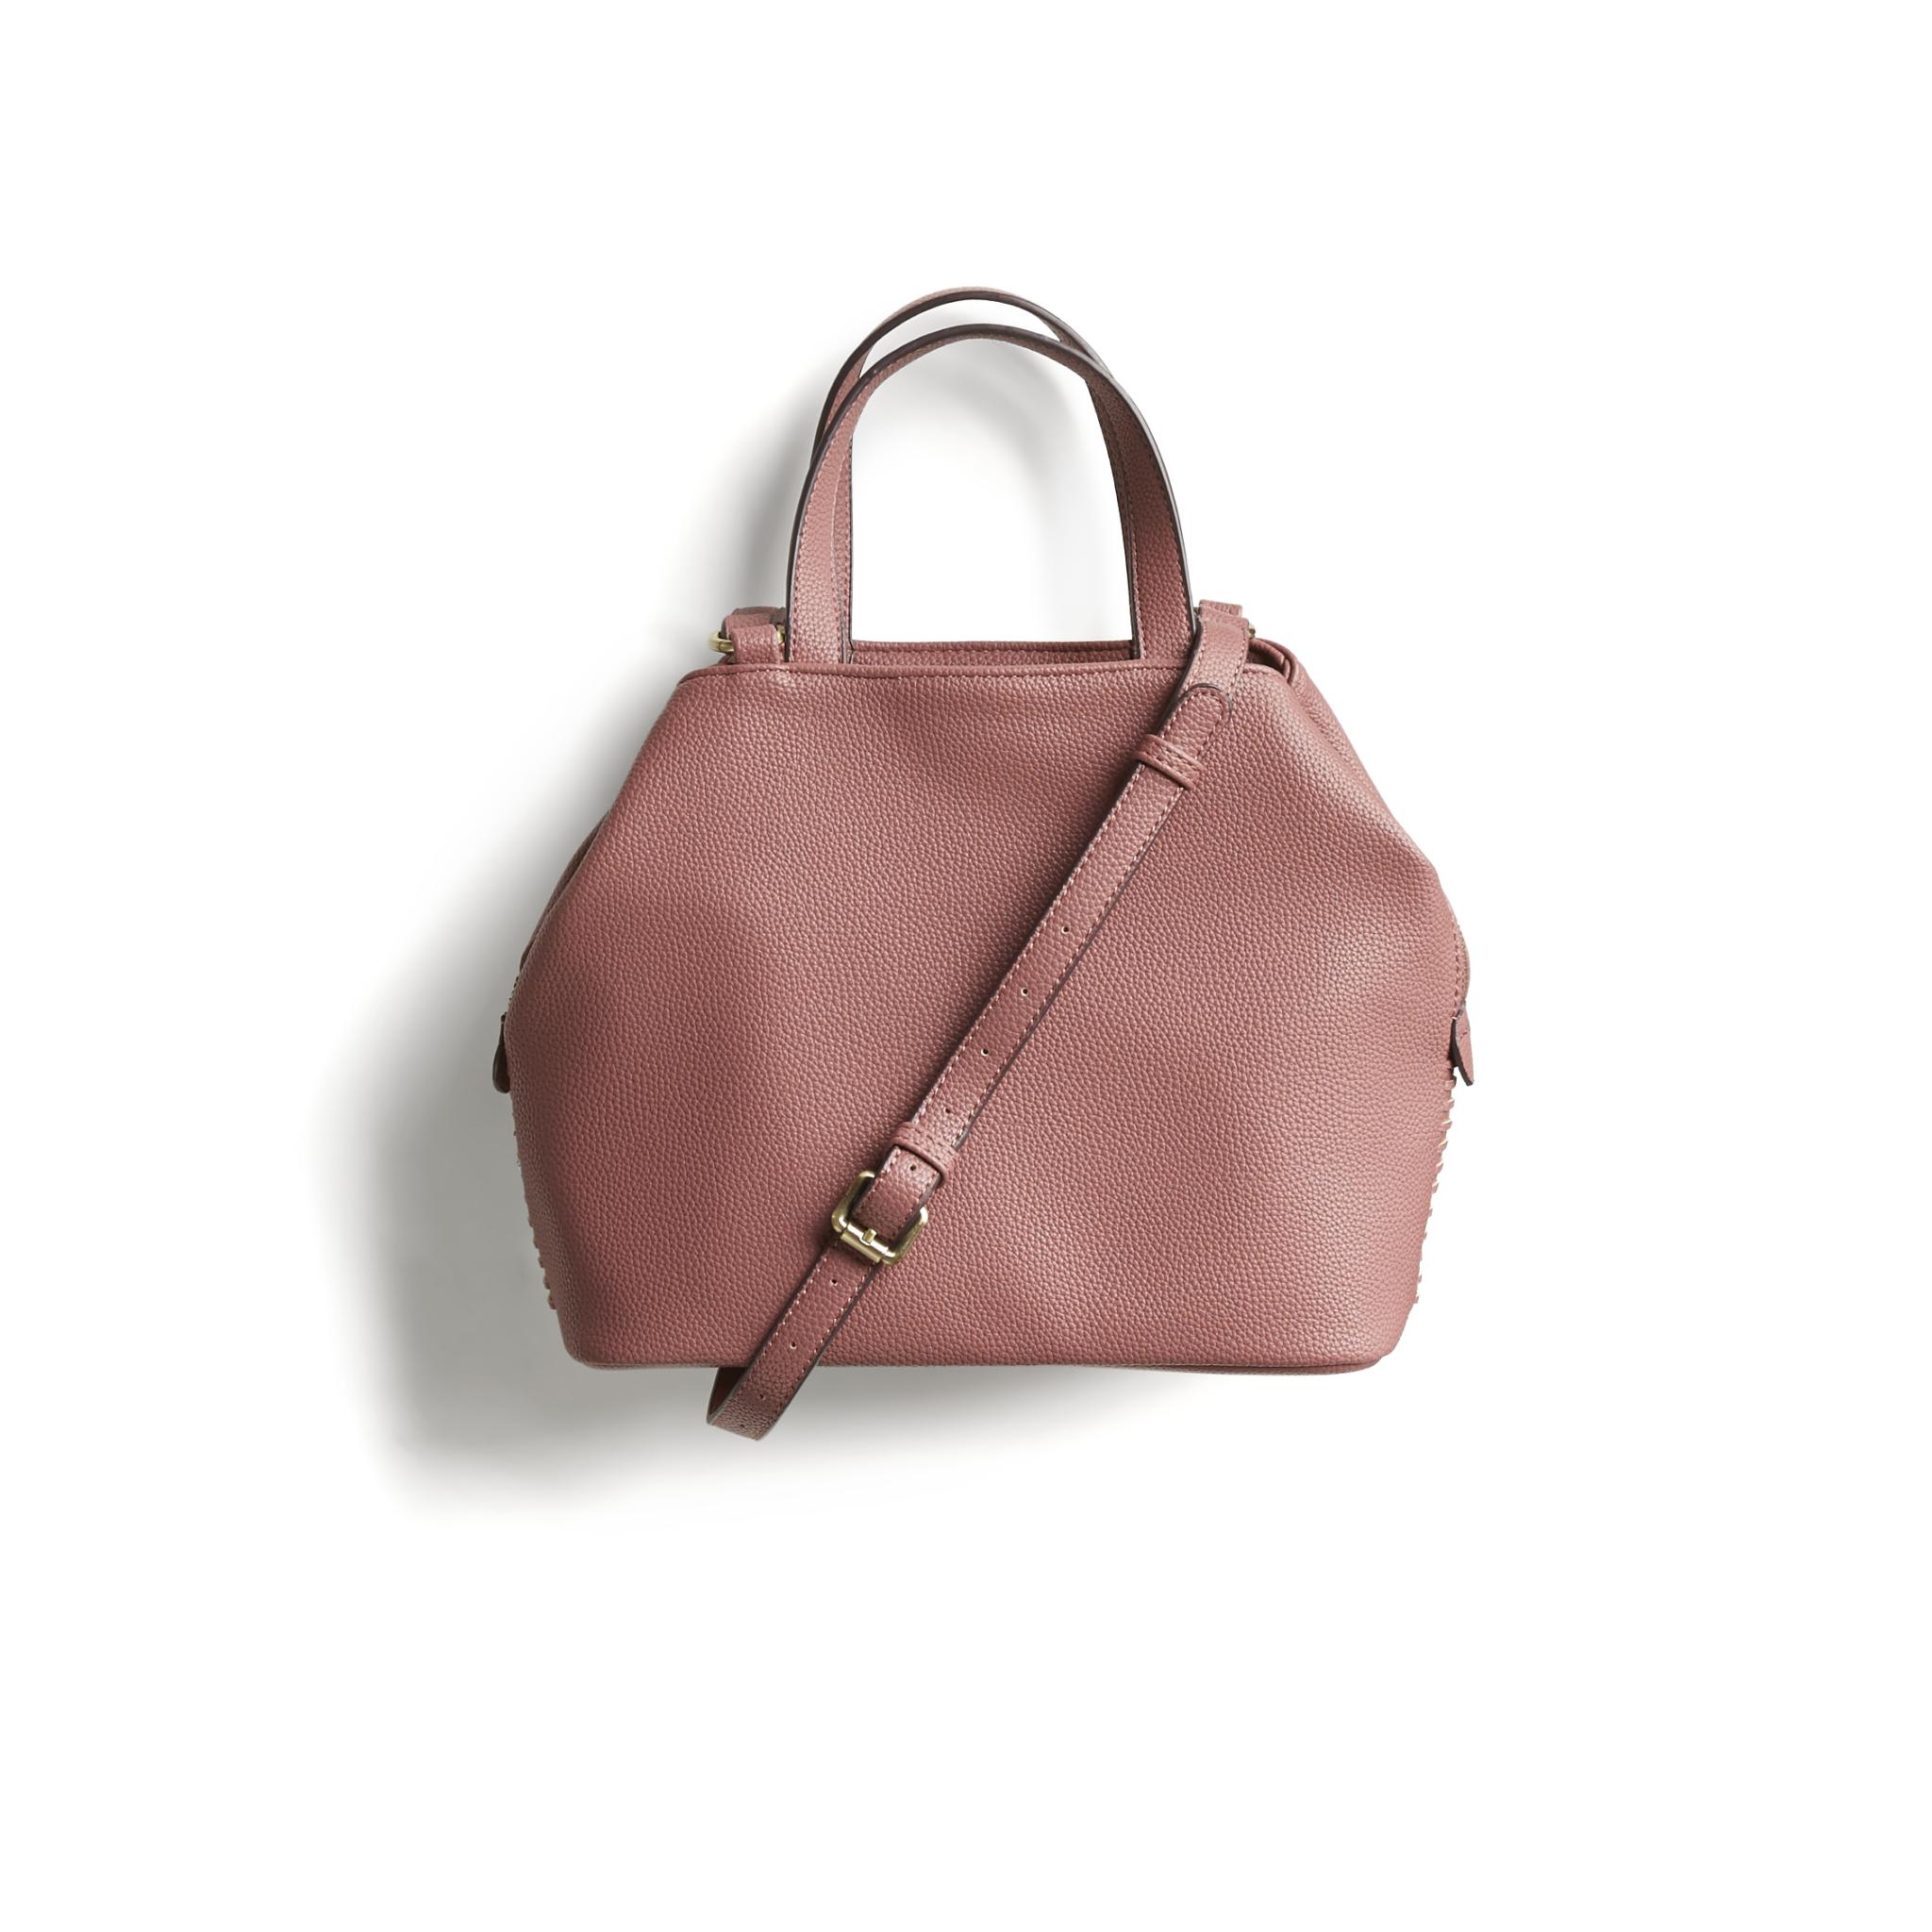 Stitch Fix Spring Stylist Picks: rosy carryall tote